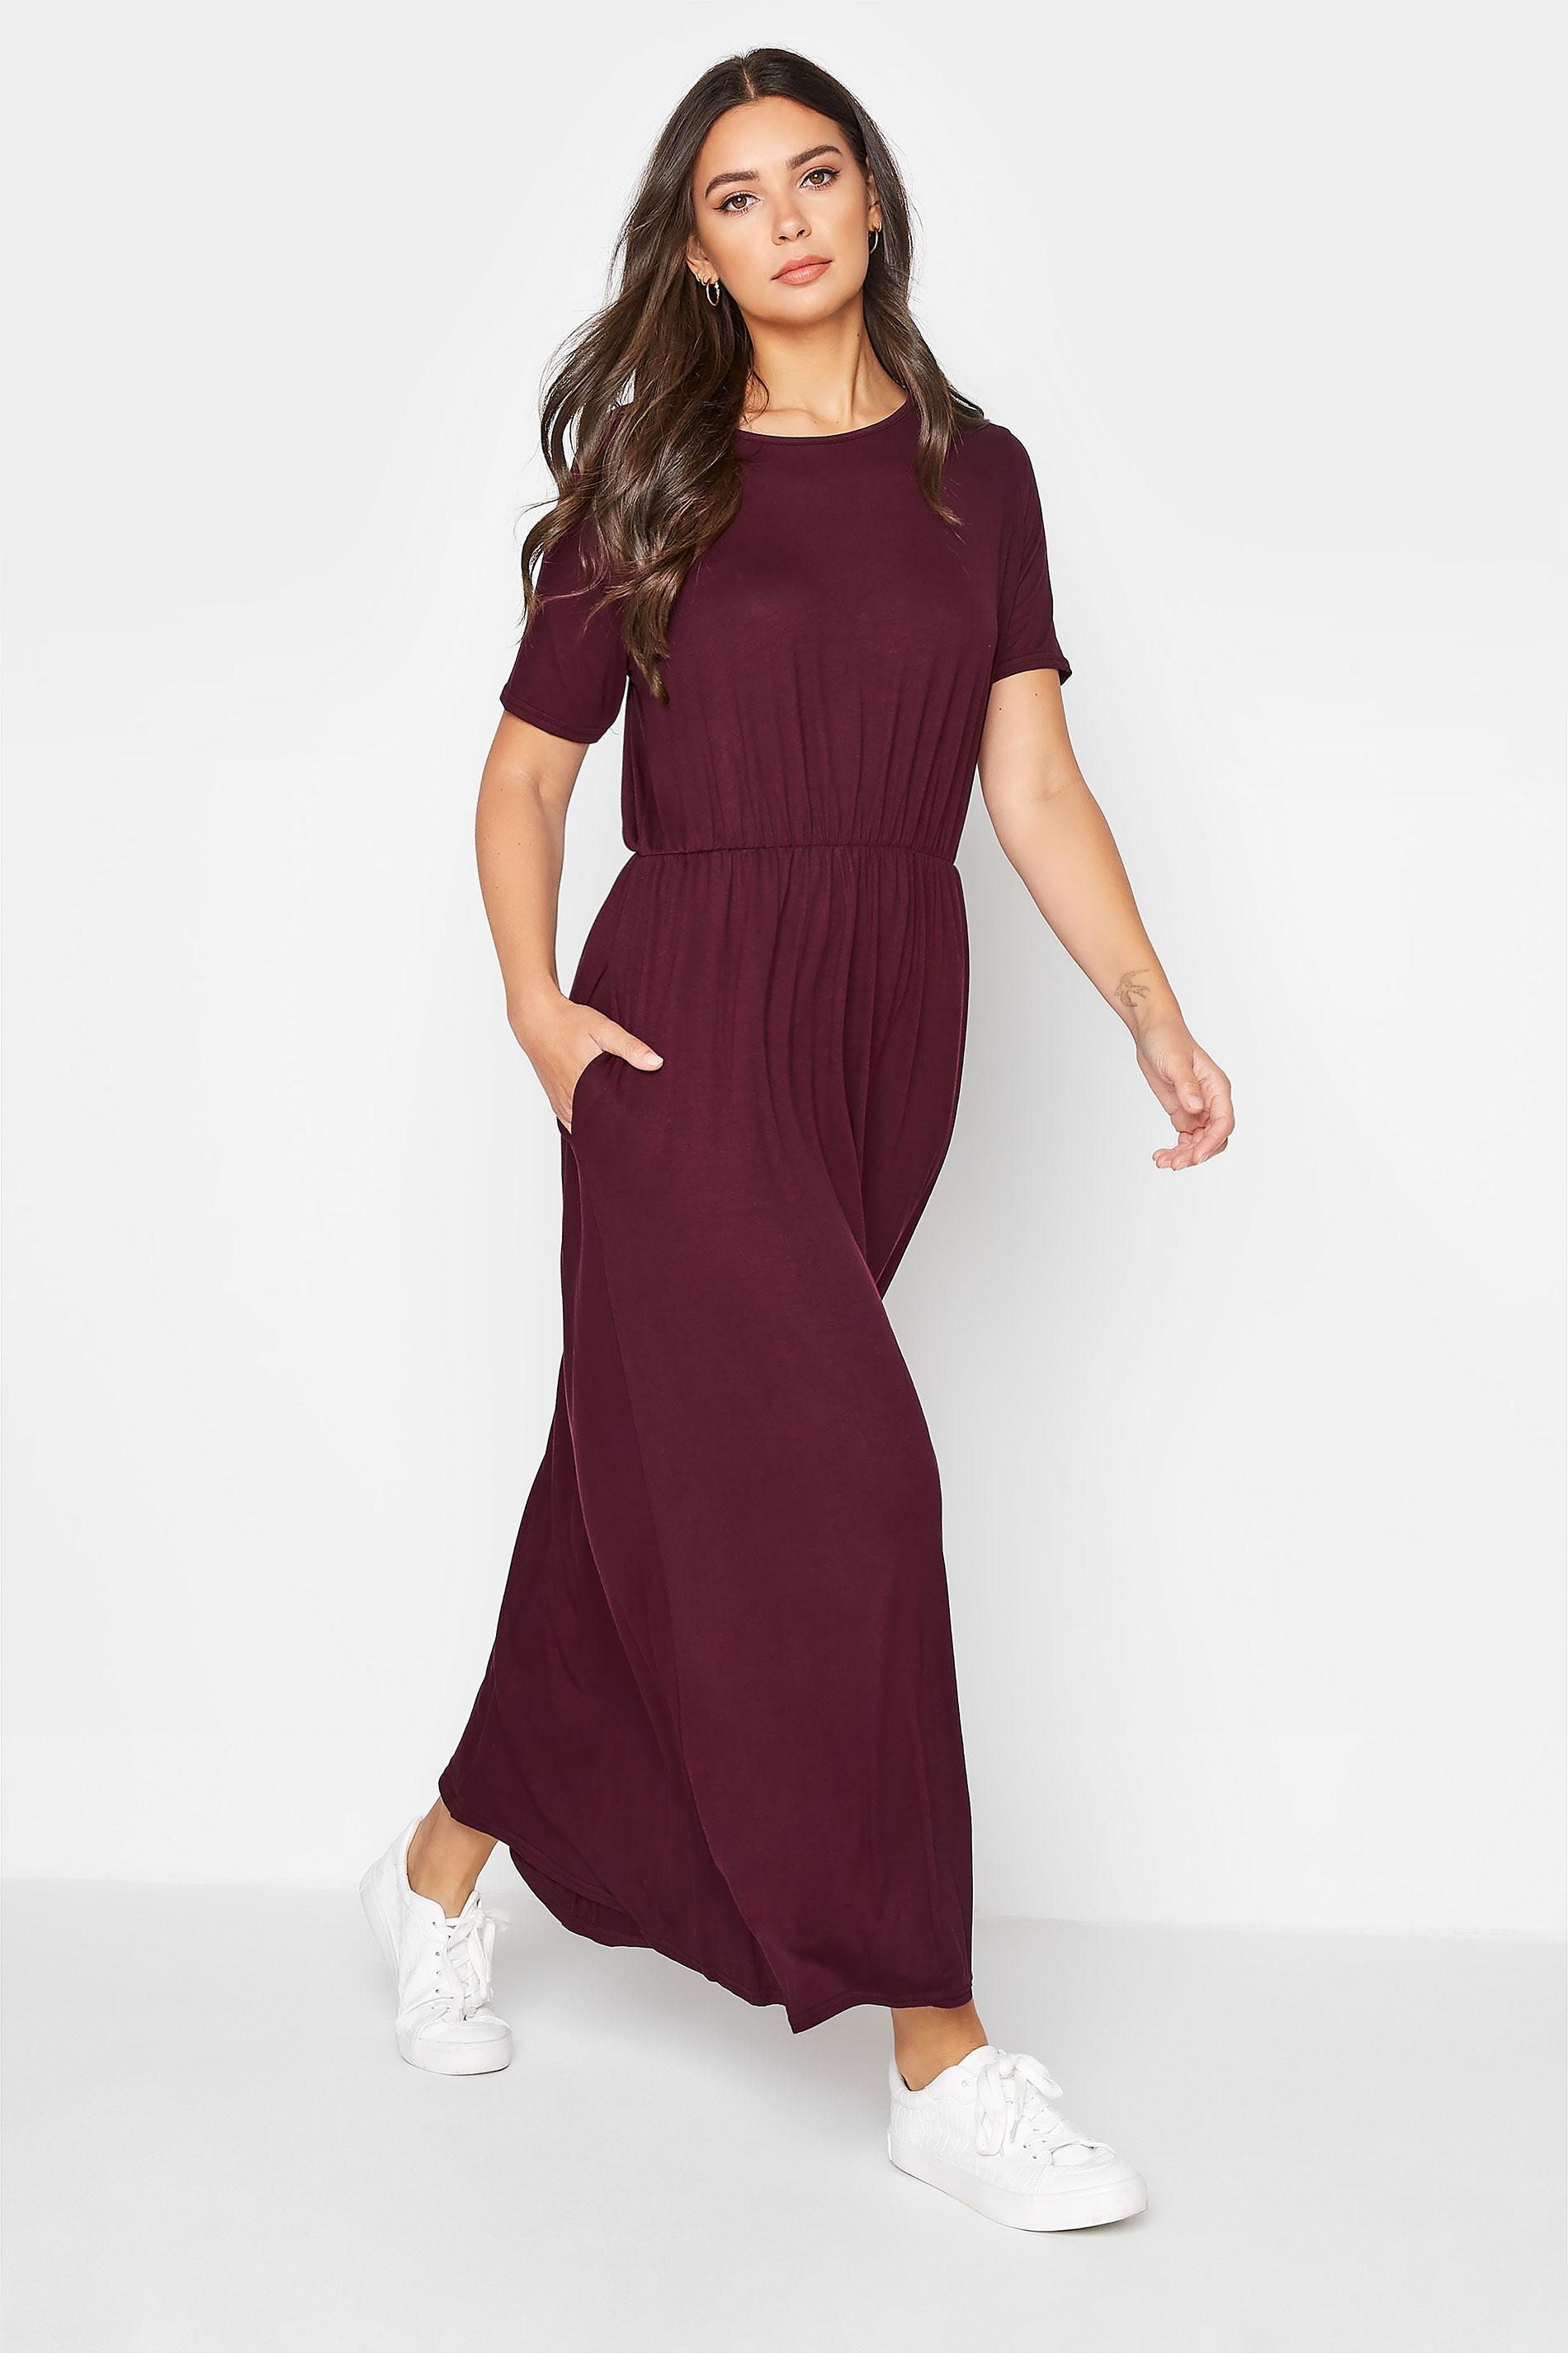 LTS Burgundy Pocket Midaxi Dress